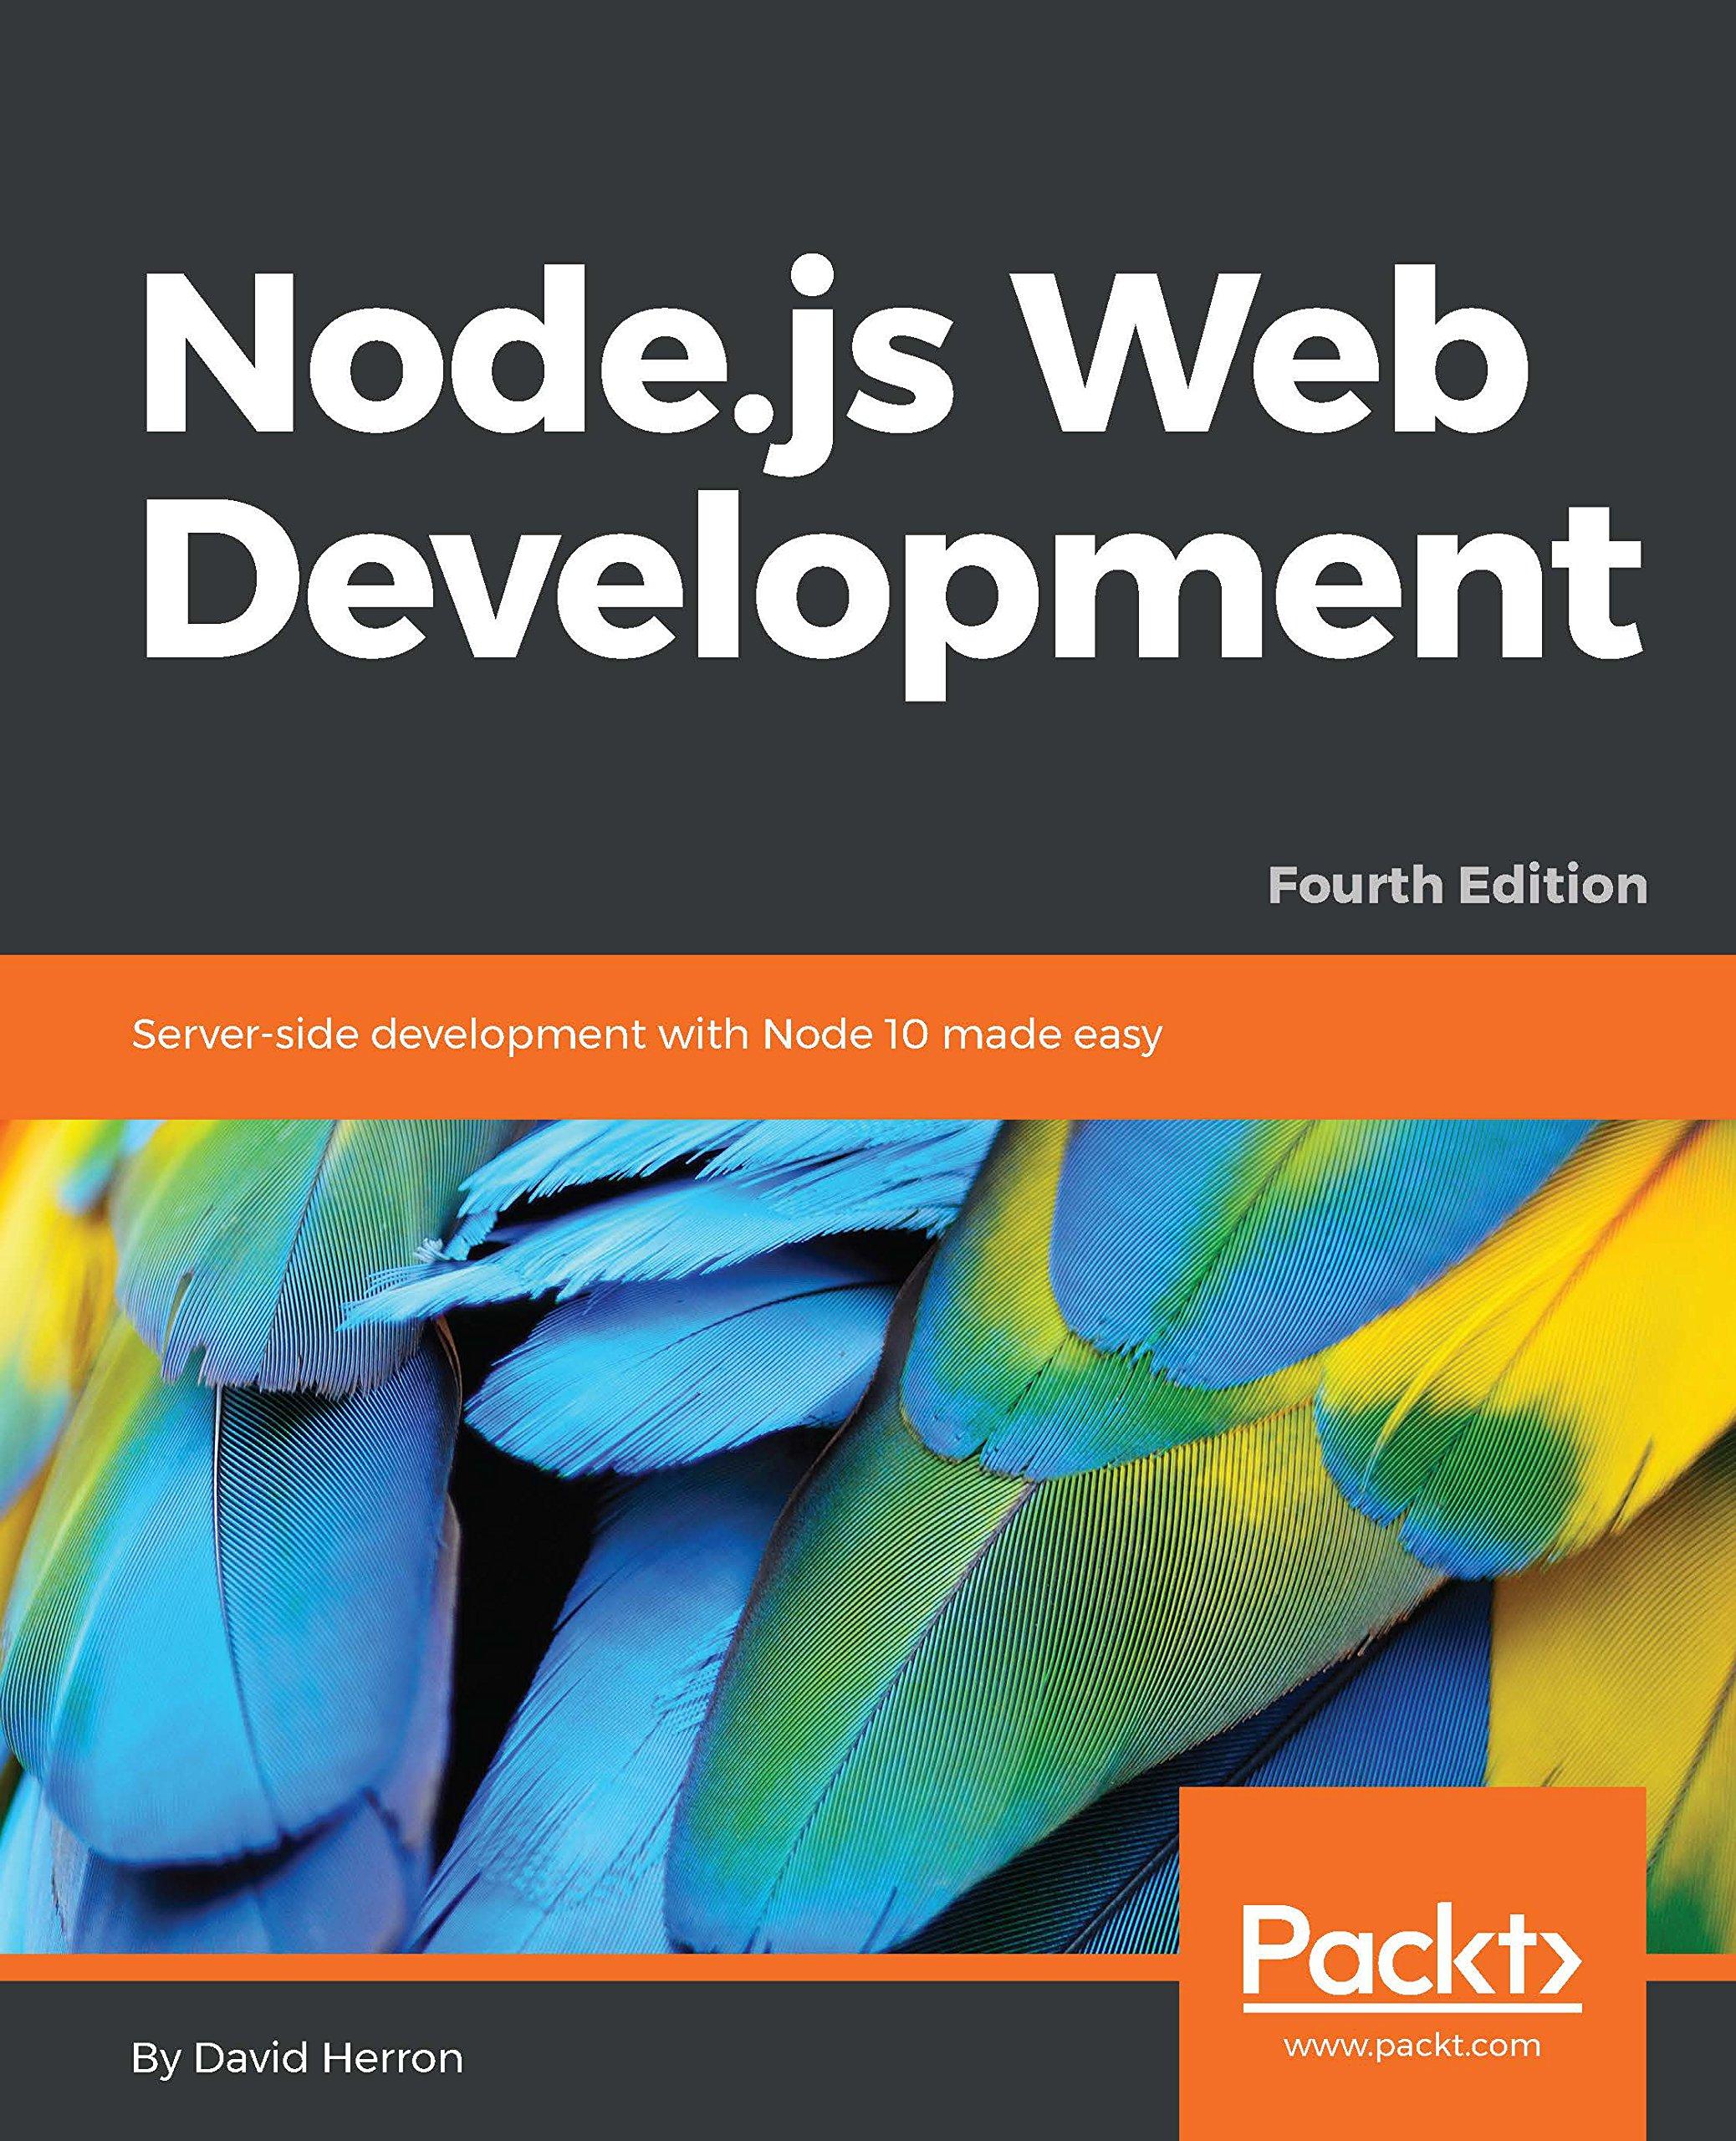 Node.js Web Development: Server-side development with Node 10 made easy, 4th Edition